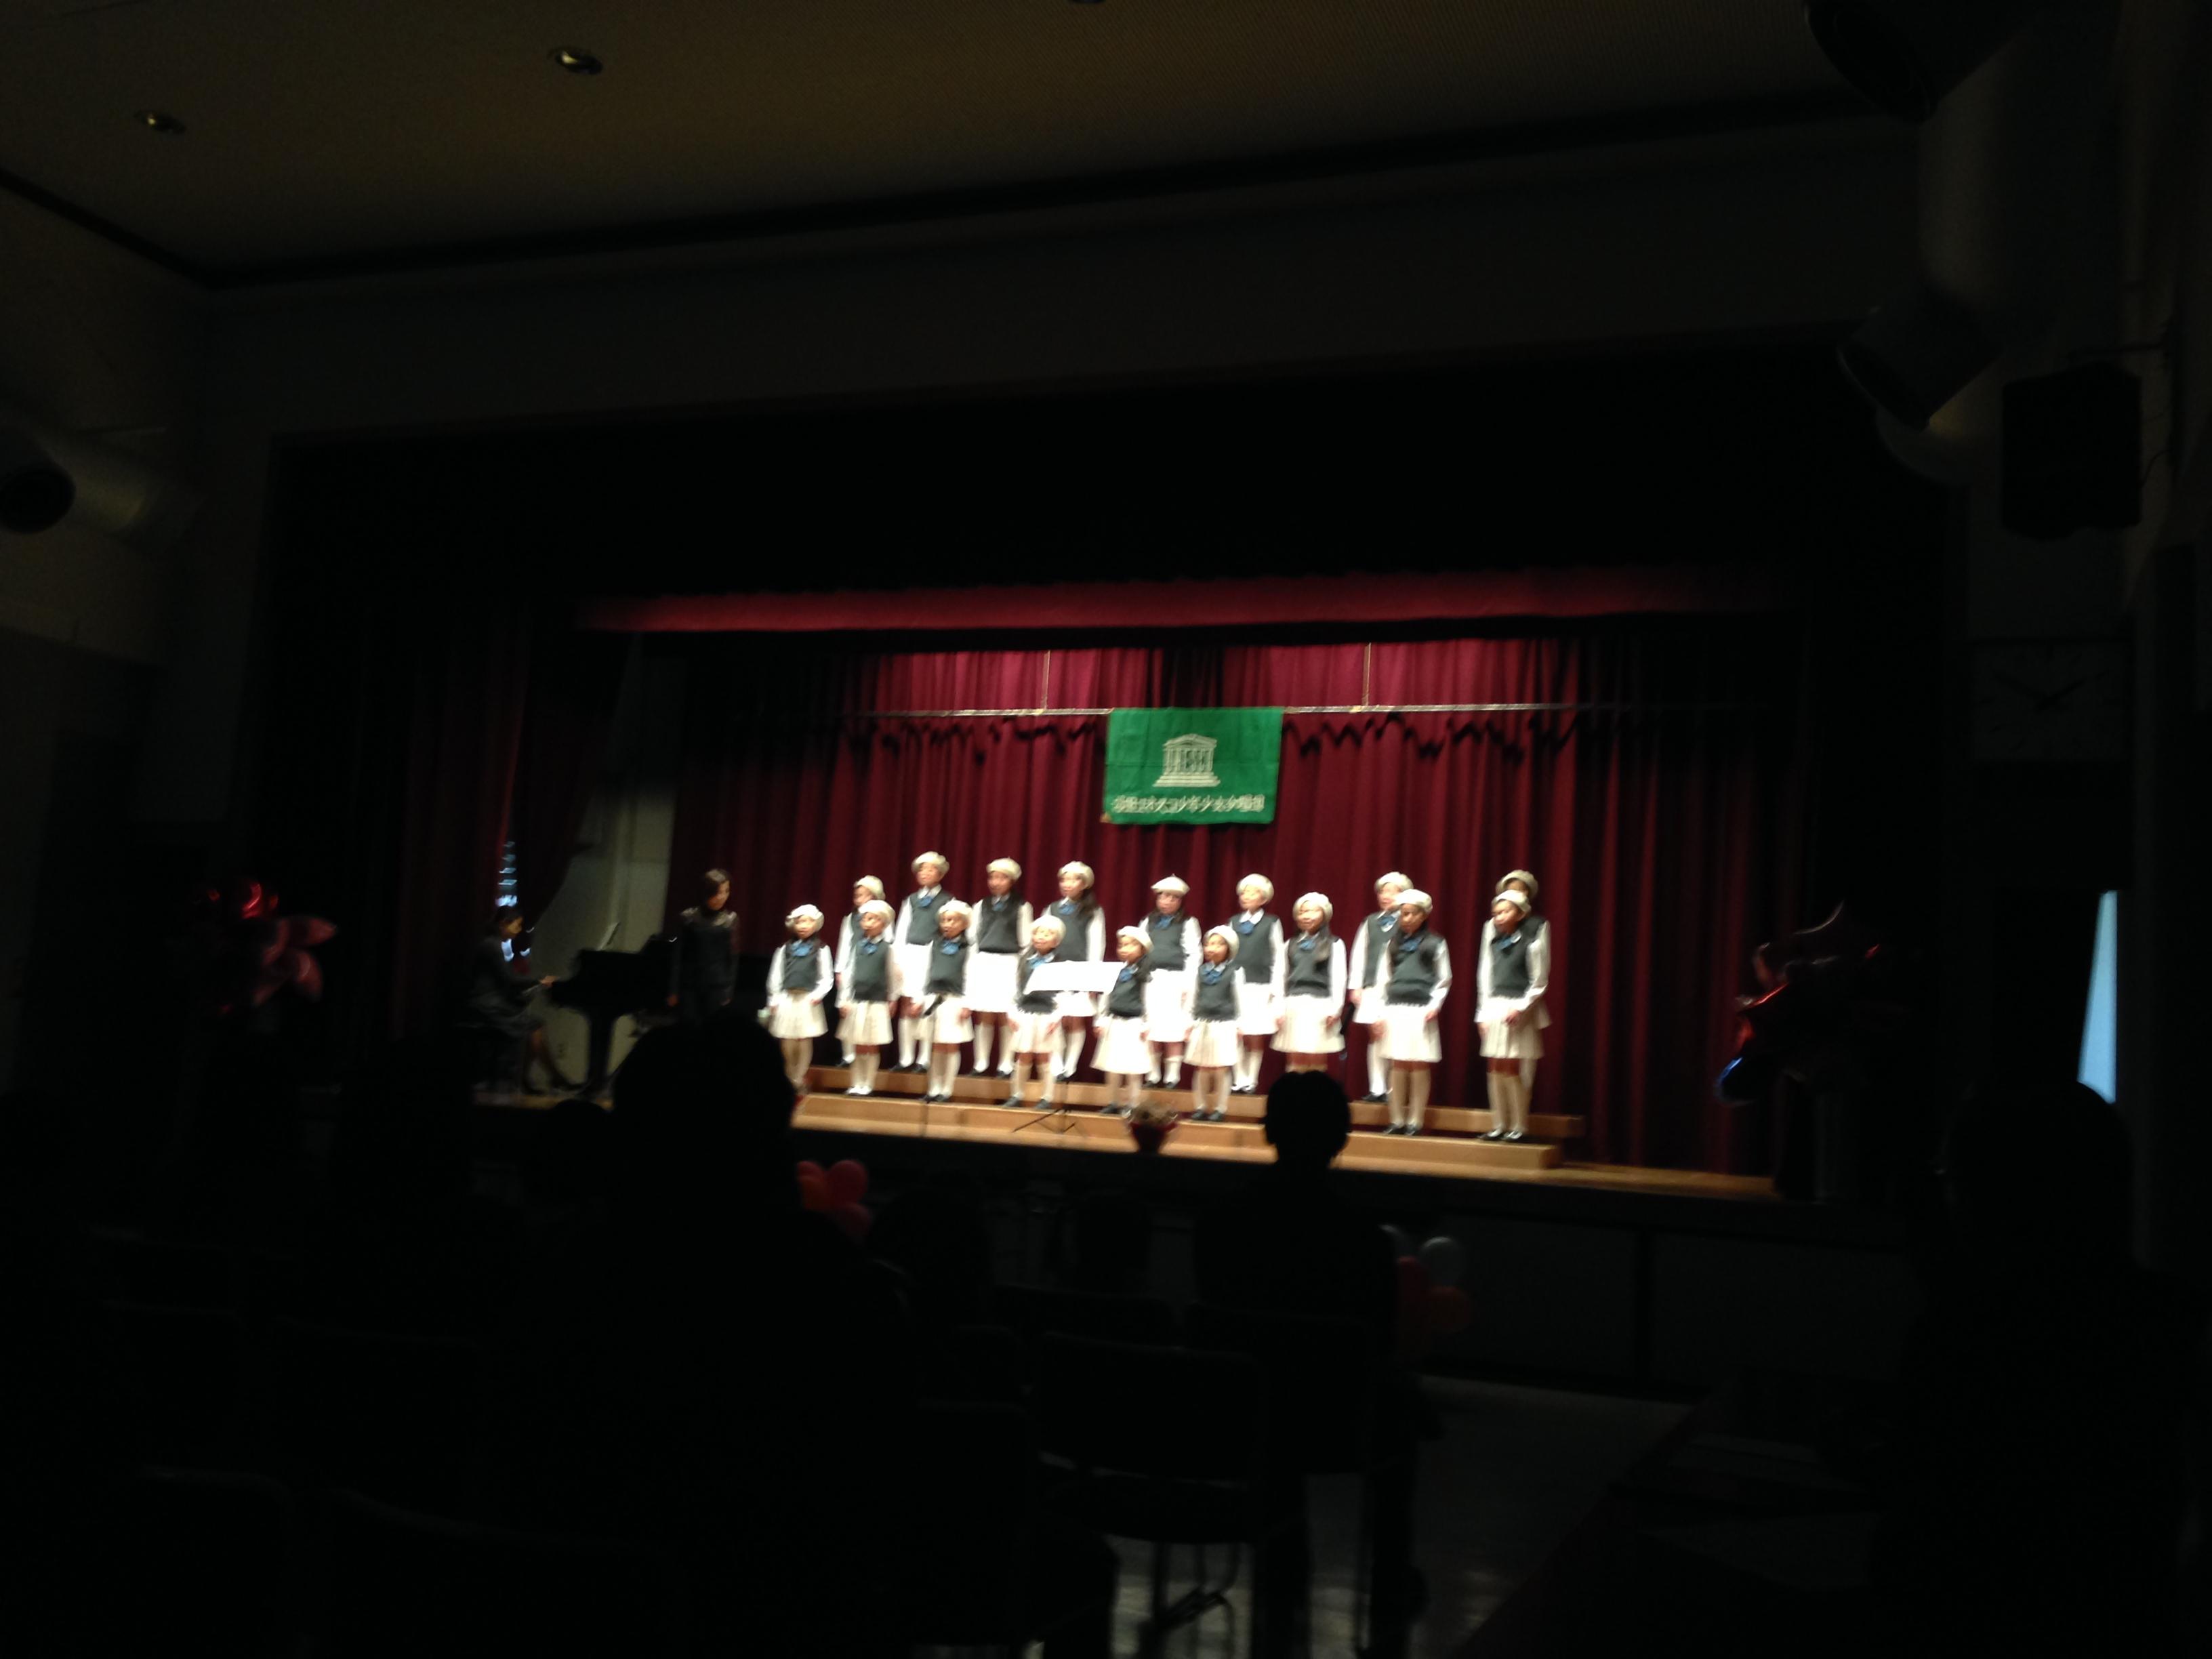 H26.3.23 第41回ユネスコ少年少女合唱団発表会